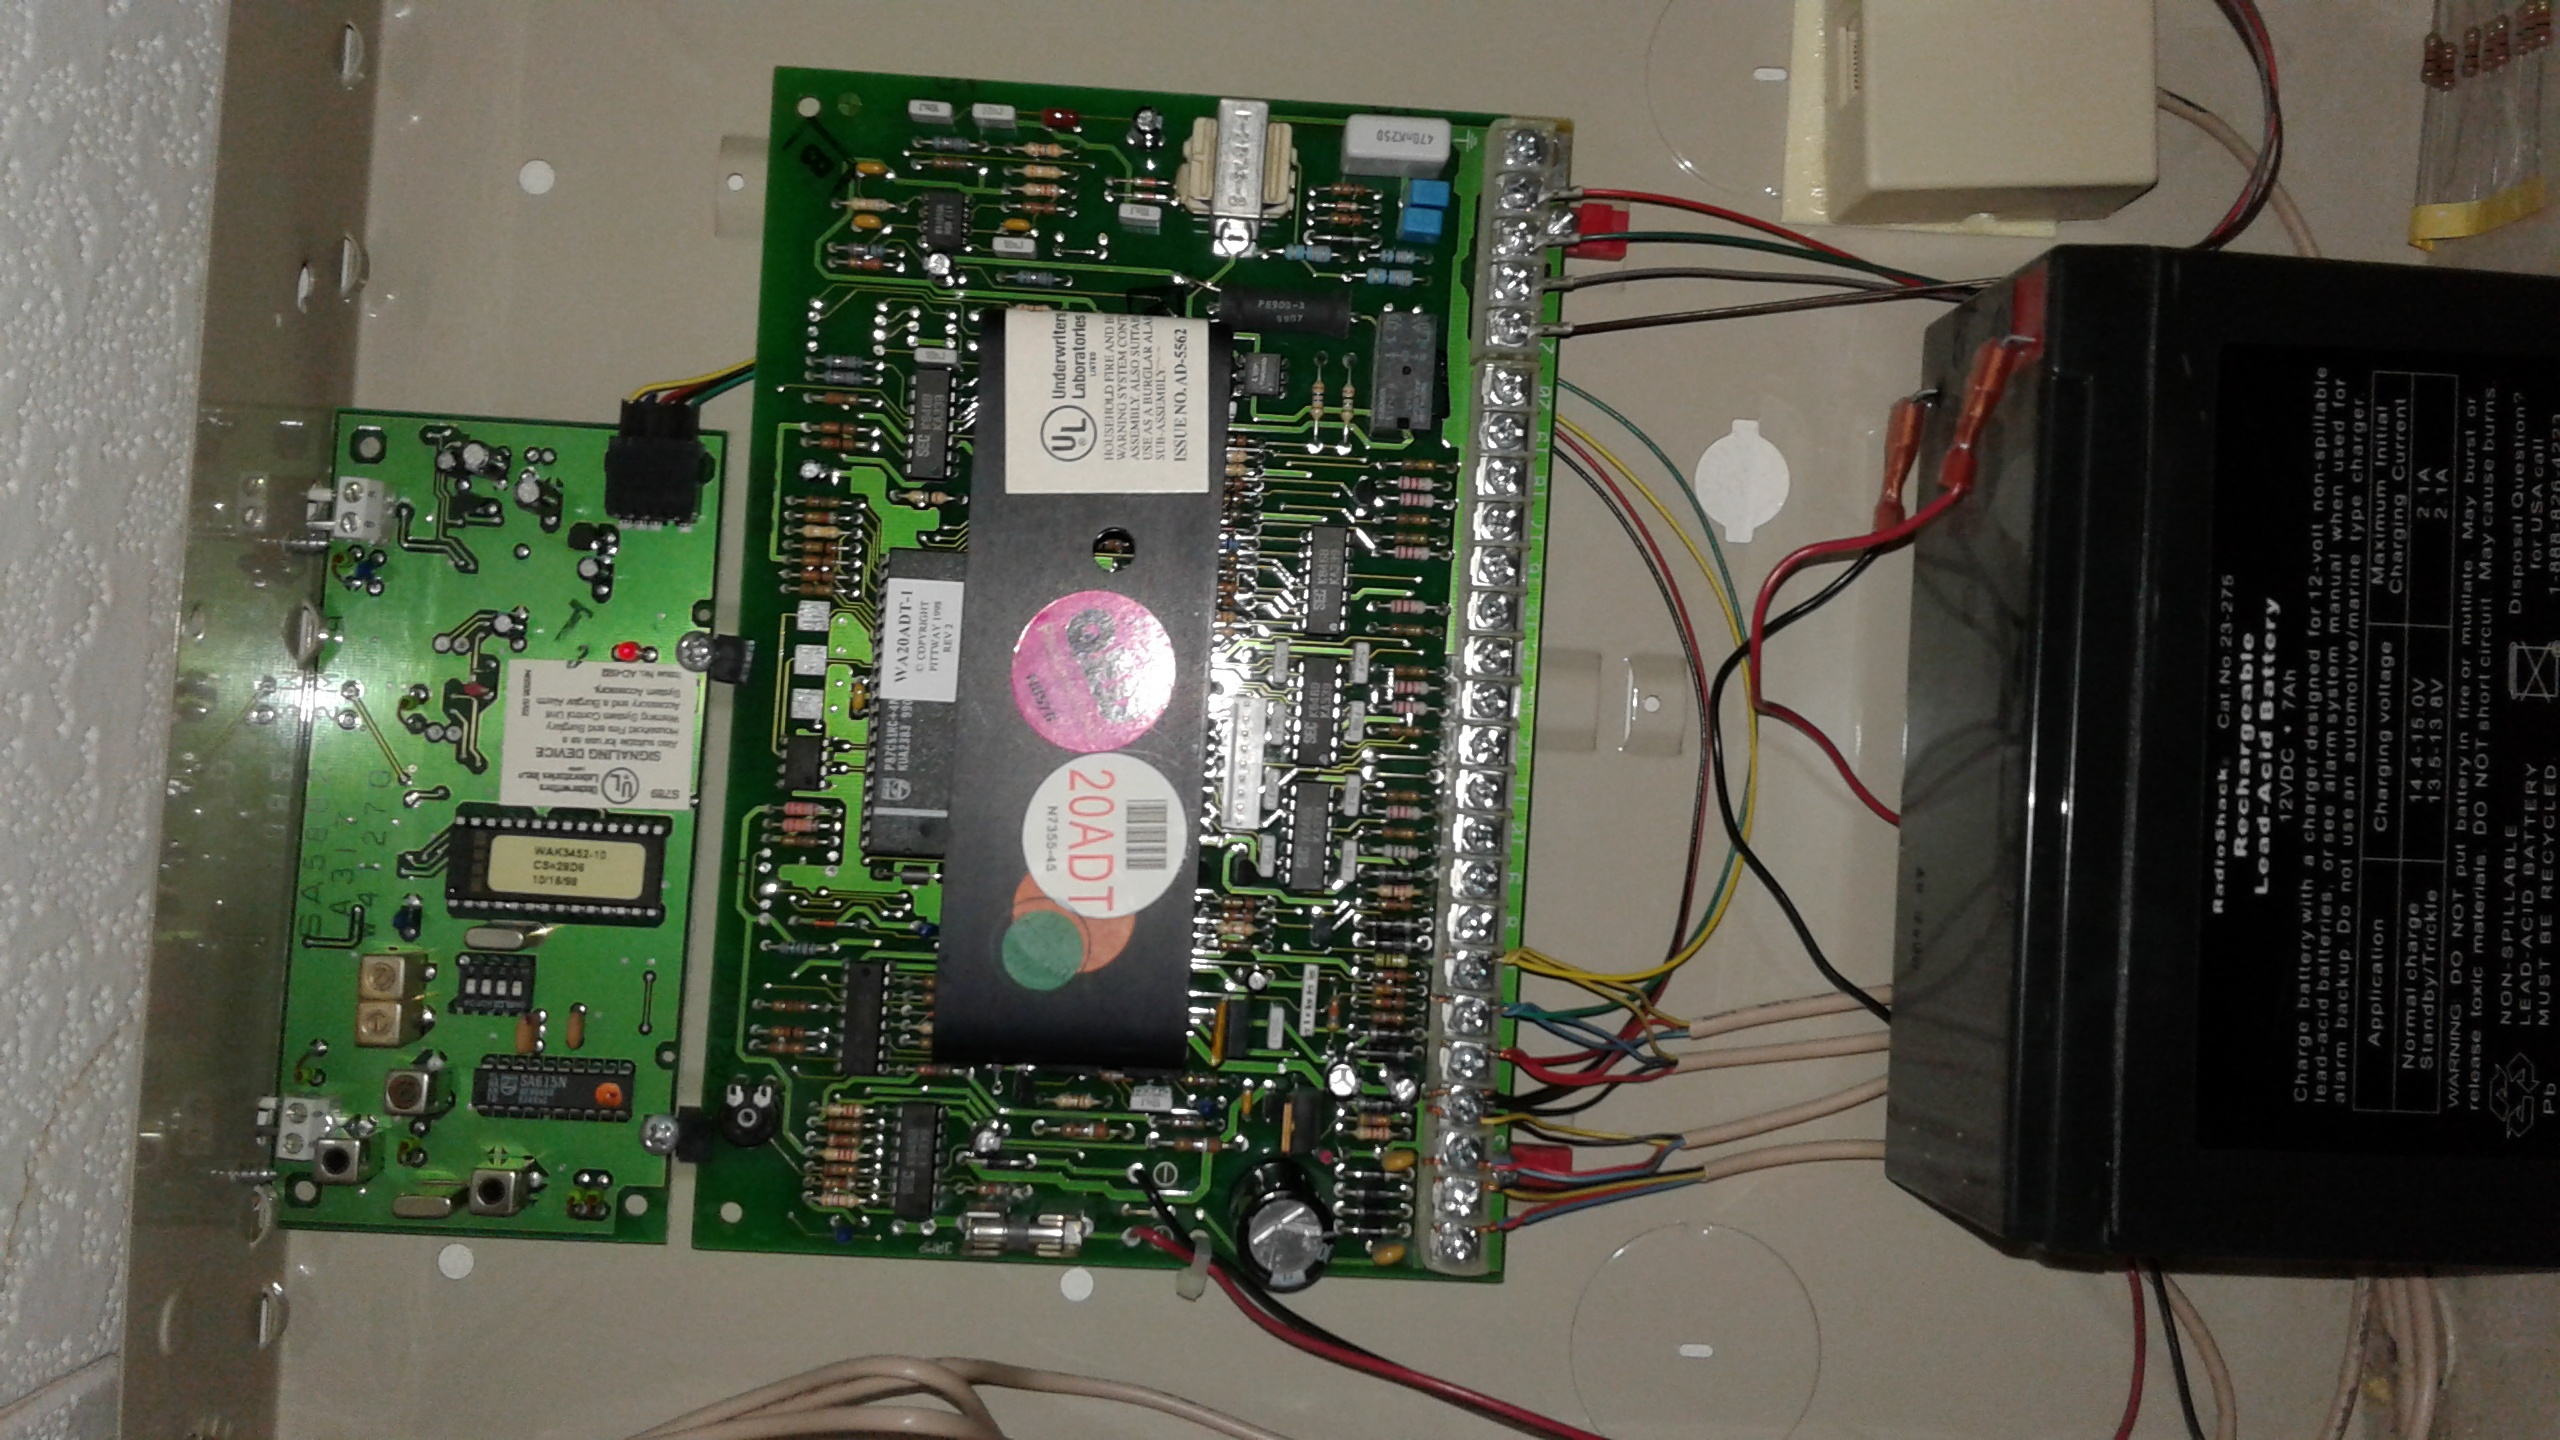 Honeywell 5816 Wireless Door Sensor And Window Alarm Grid Remove The Casing Of Hub Keypad Circuit Boards